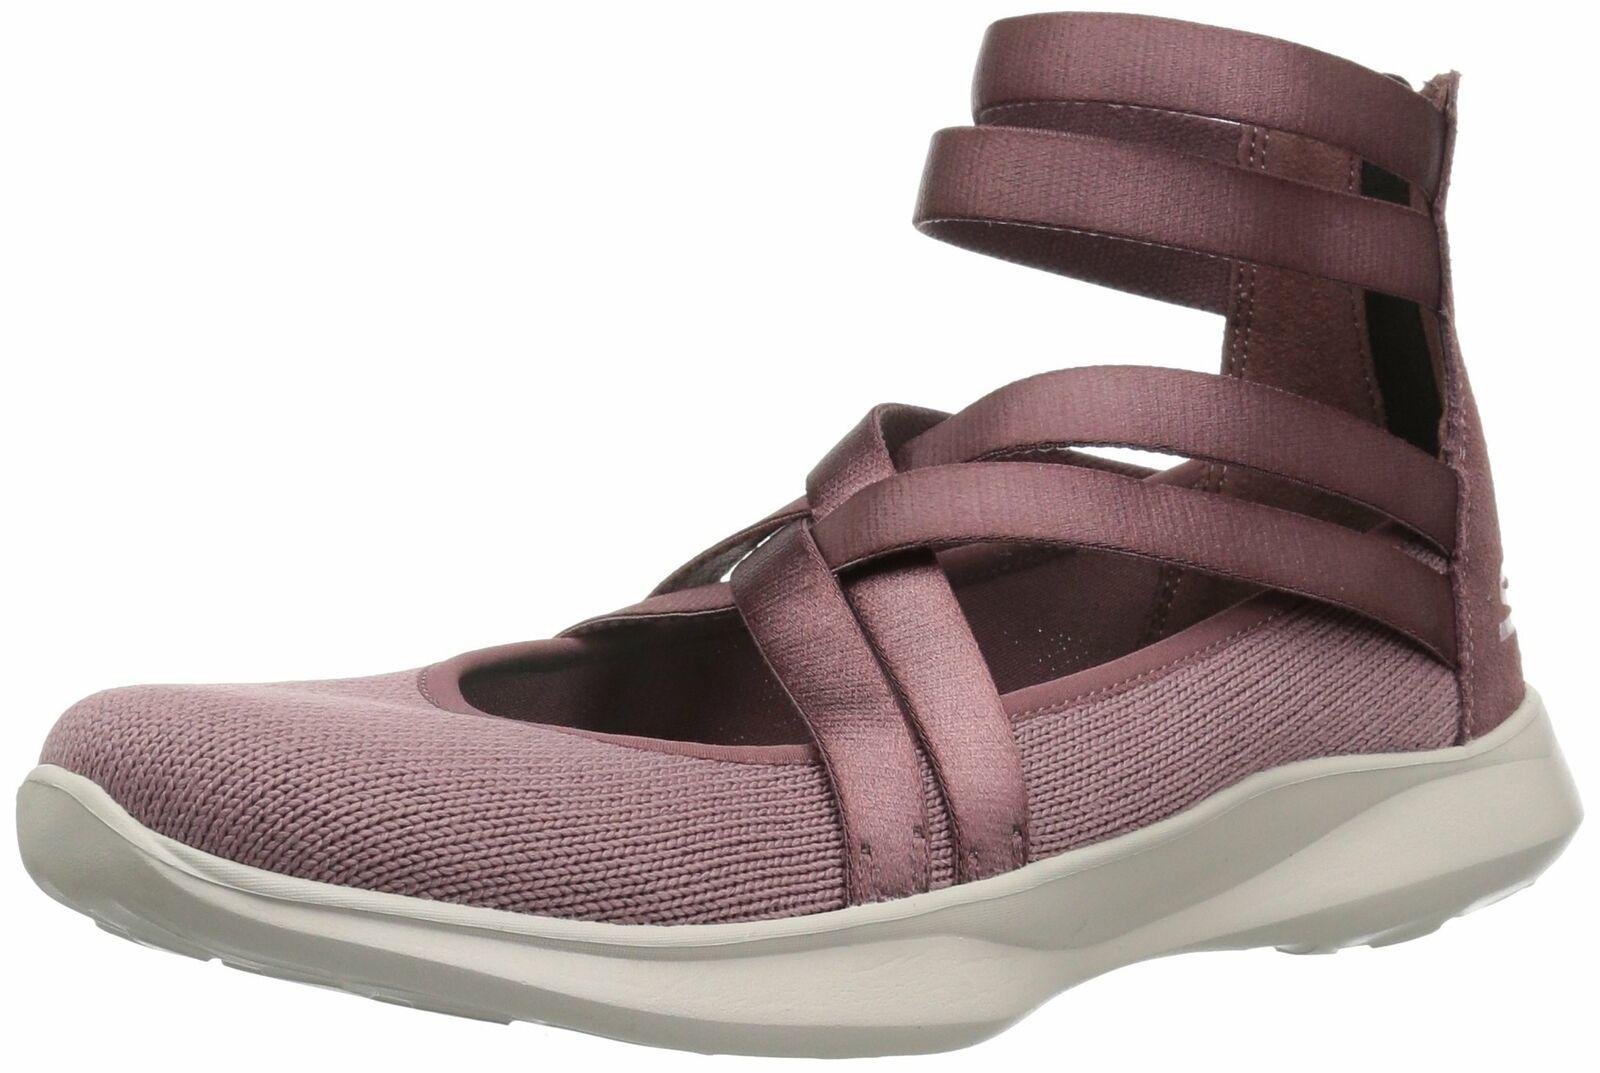 Skechers Women's Serene Dream Sneaker